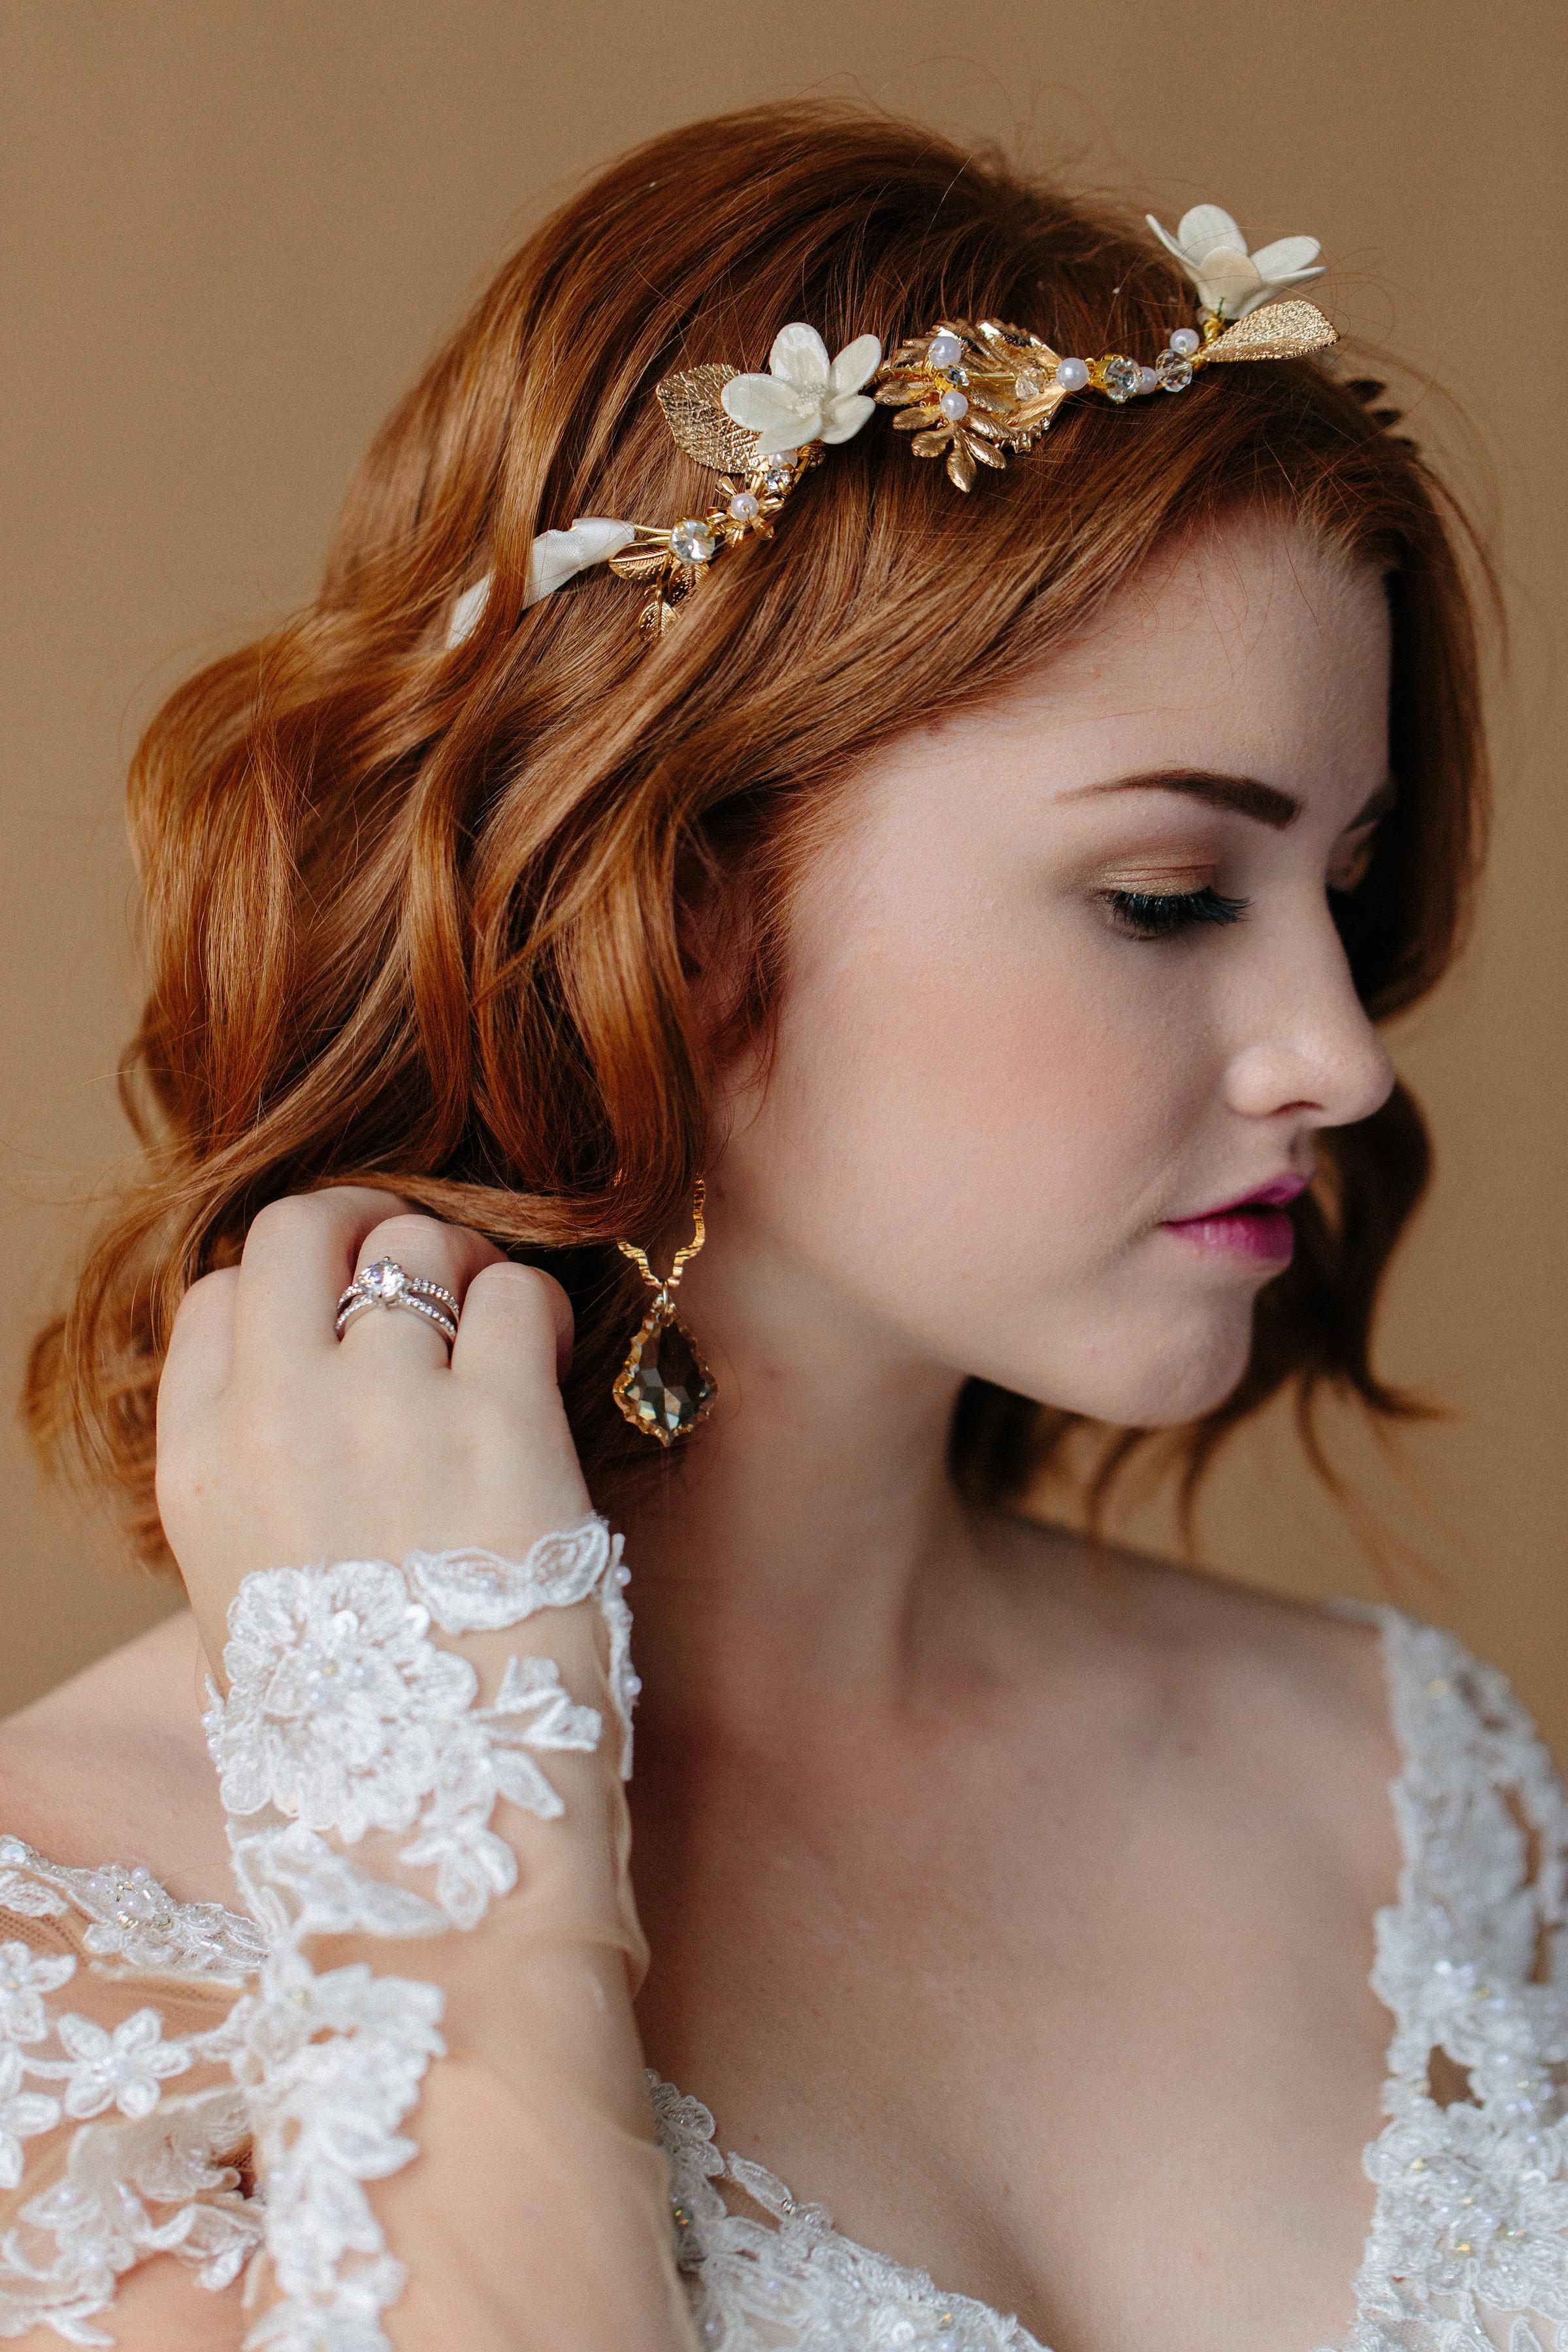 Headpiece:  Hair Comes the Bride  | Earring:  Liz Law  | Ring: Icon Stylist | Dress:  Bel Fiore Bridal , Essence of Australia | Hair & Makeup:  Corianne Elizabeth Beauty  | Photography:  Michelle Scott Photography